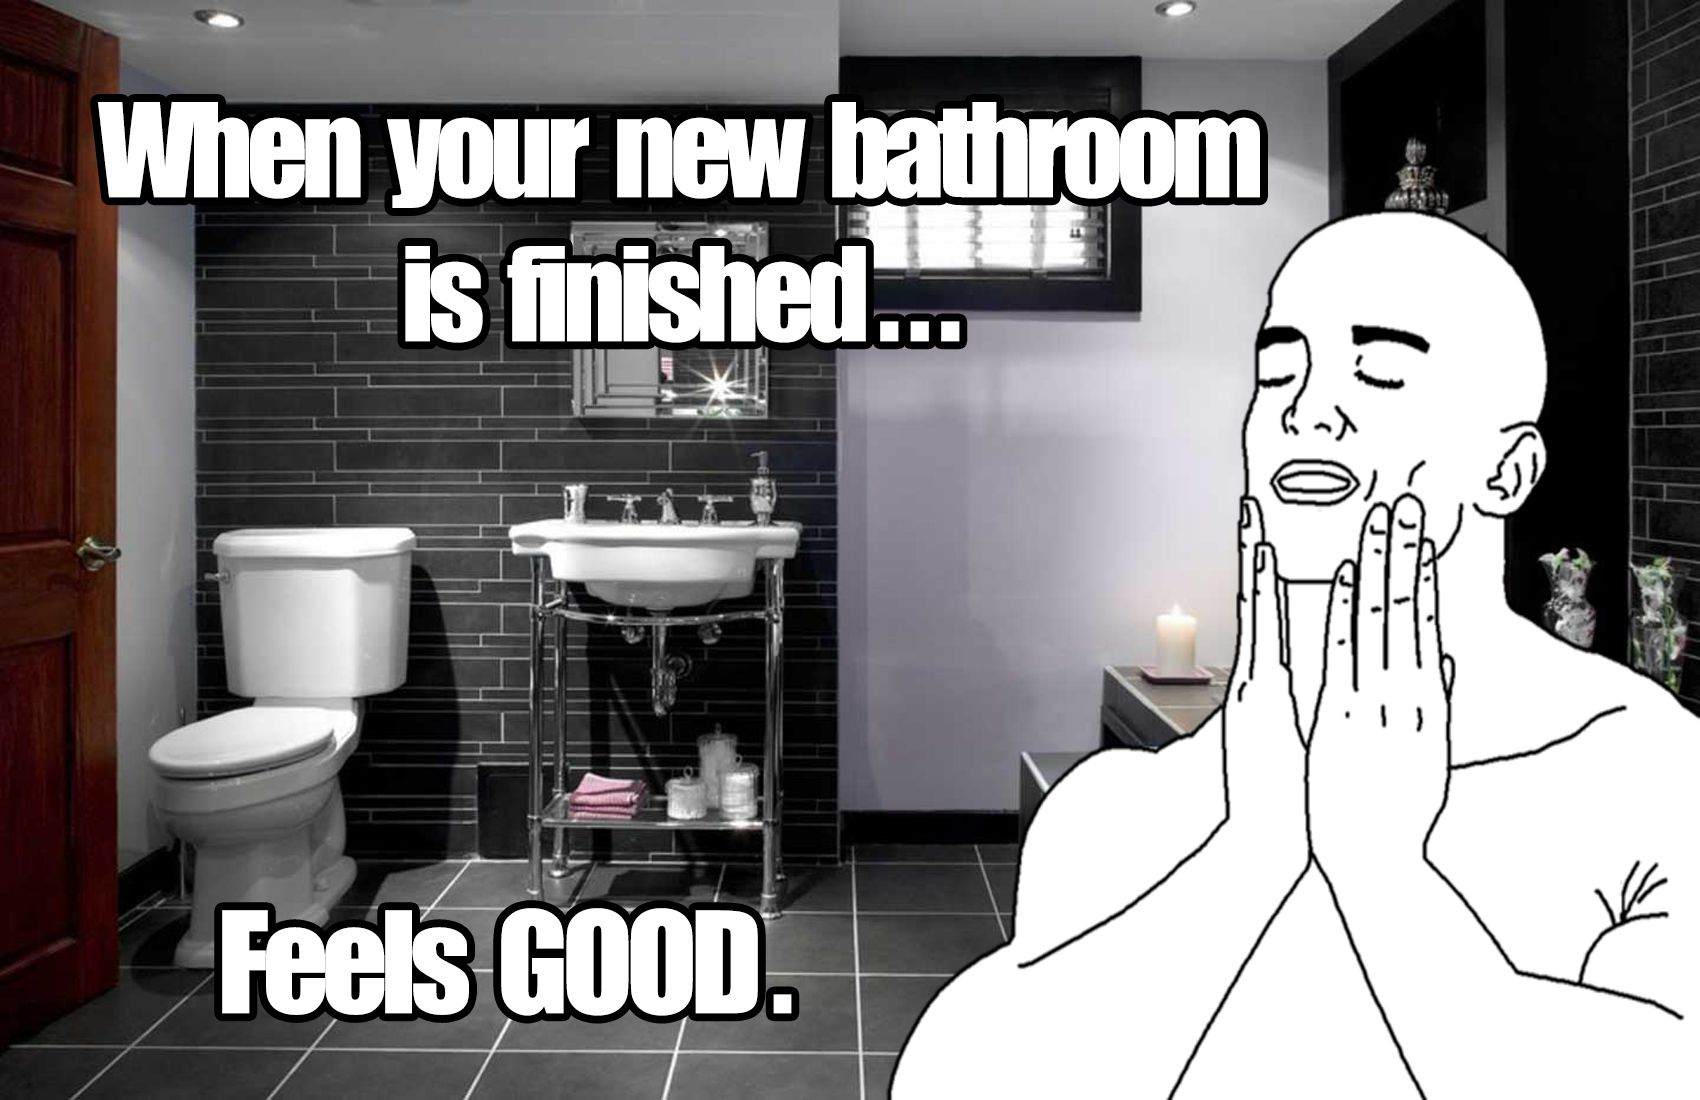 Funny Bathroom Renovation Memes | Bathroom humor, Bathroom ... on funny concrete memes, funny tile memes, funny jewelry memes, funny lawn care memes, funny tools memes, funny automotive memes, funny home memes, funny equipment memes, funny repair memes, funny restaurants memes, funny manufacturing memes, funny handyman memes, funny air conditioning memes, funny leasing memes, funny carpentry memes, funny paint memes, funny decorating memes, funny doors memes, funny service memes,